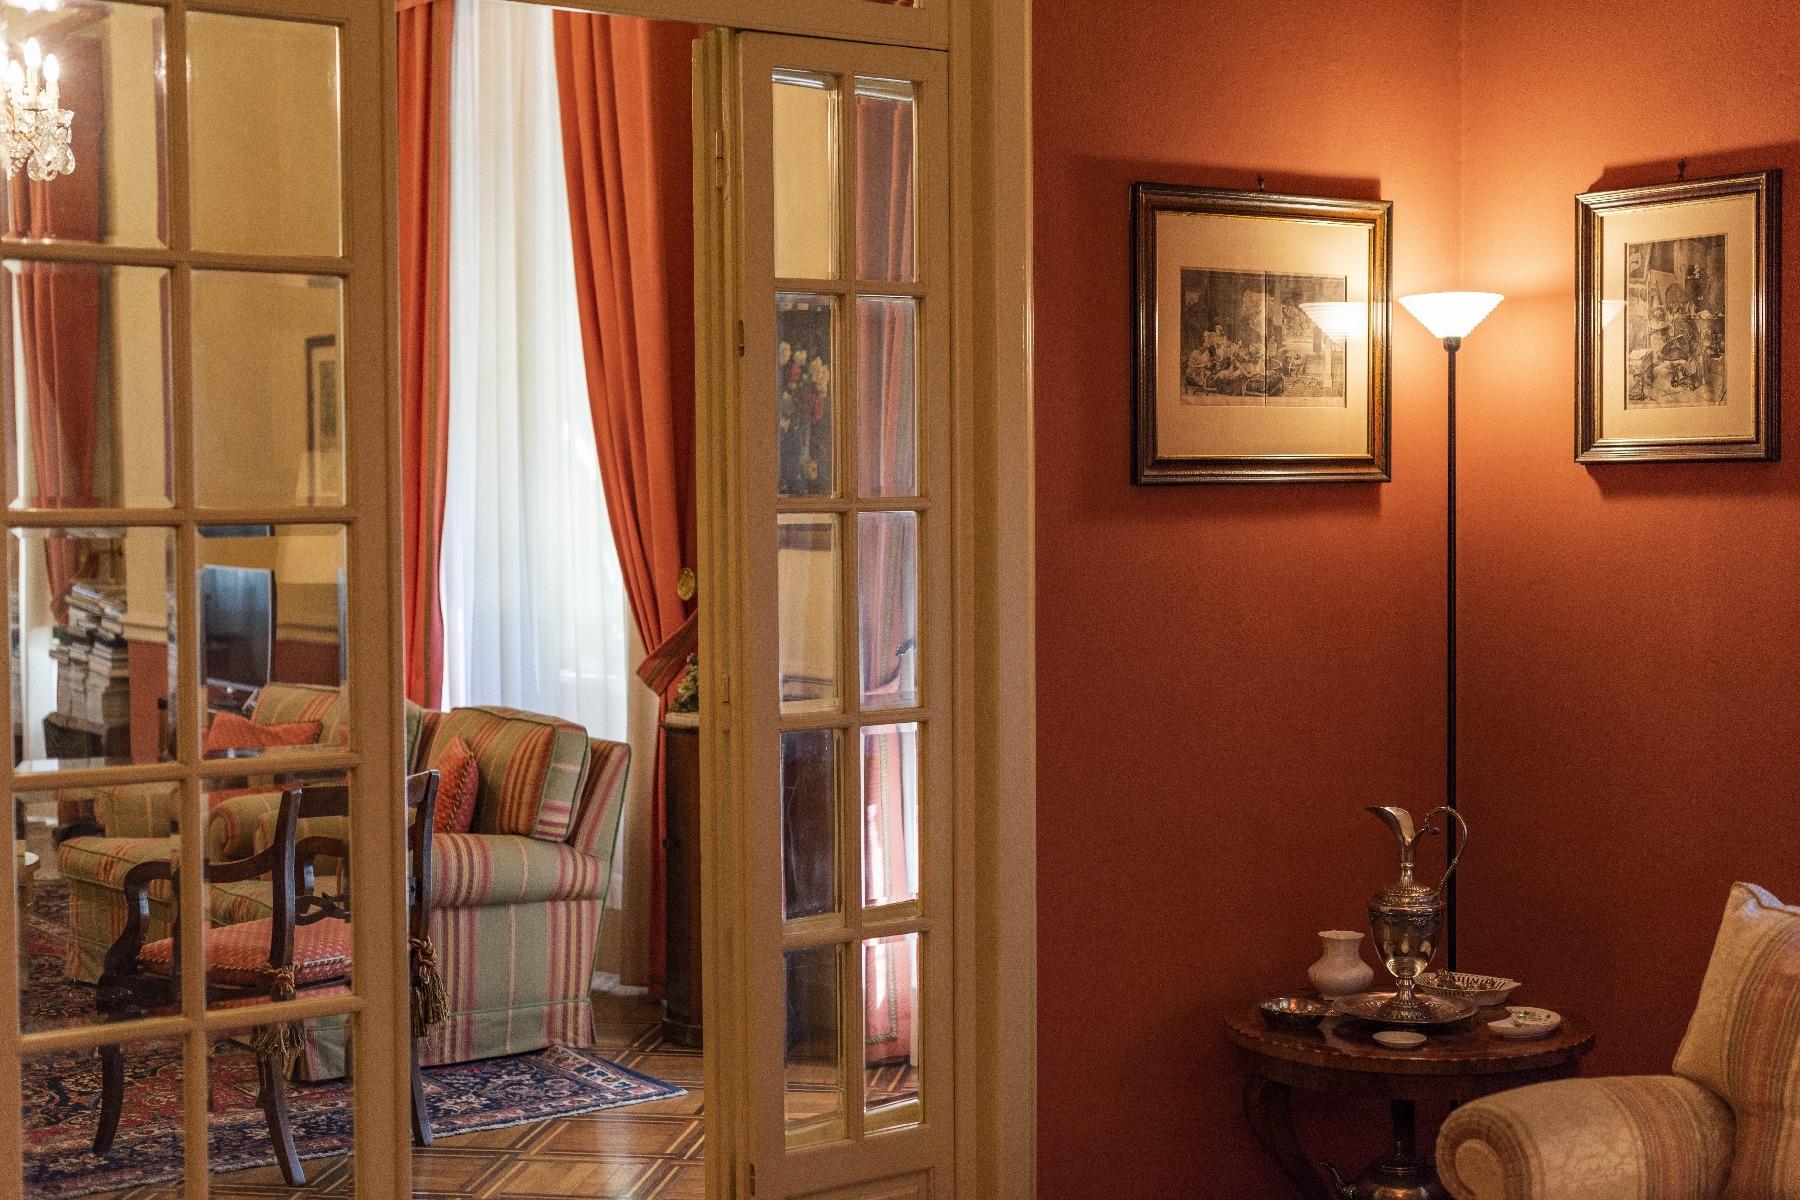 Villa in Vendita a Lucca: 5 locali, 660 mq - Foto 9